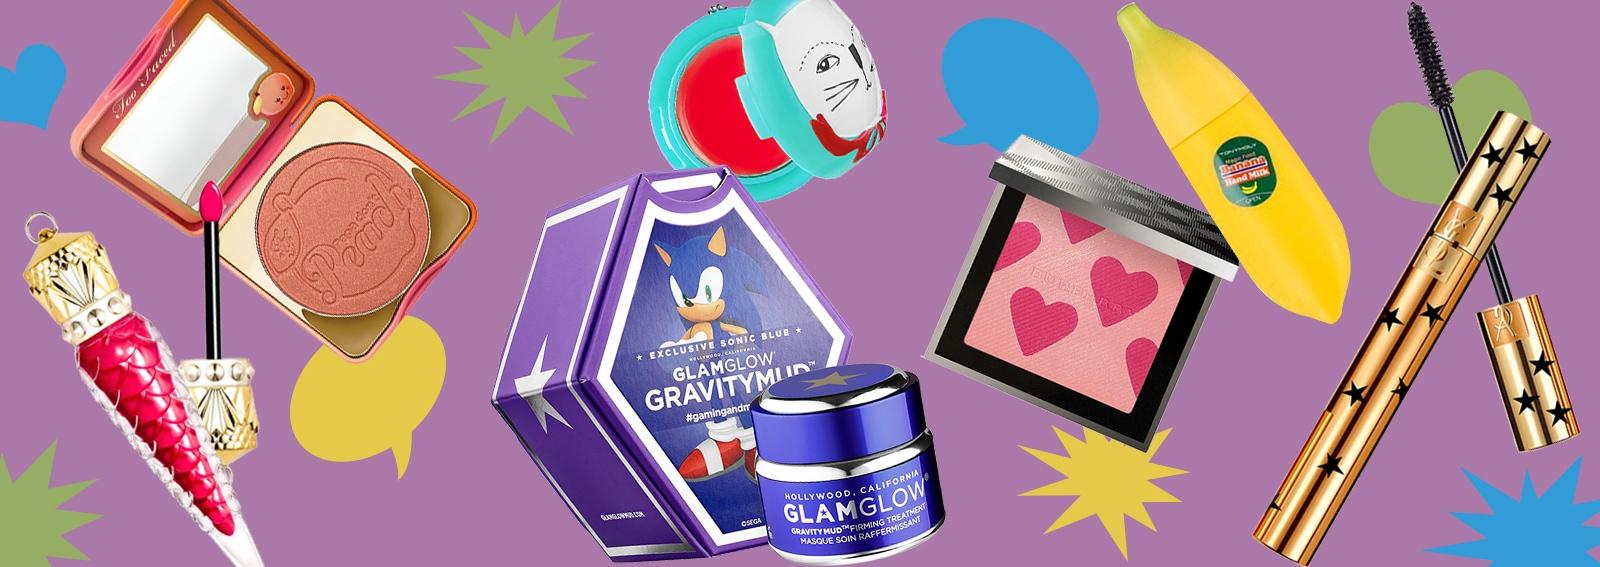 cover-pop-make-up-ecco-i-desktop